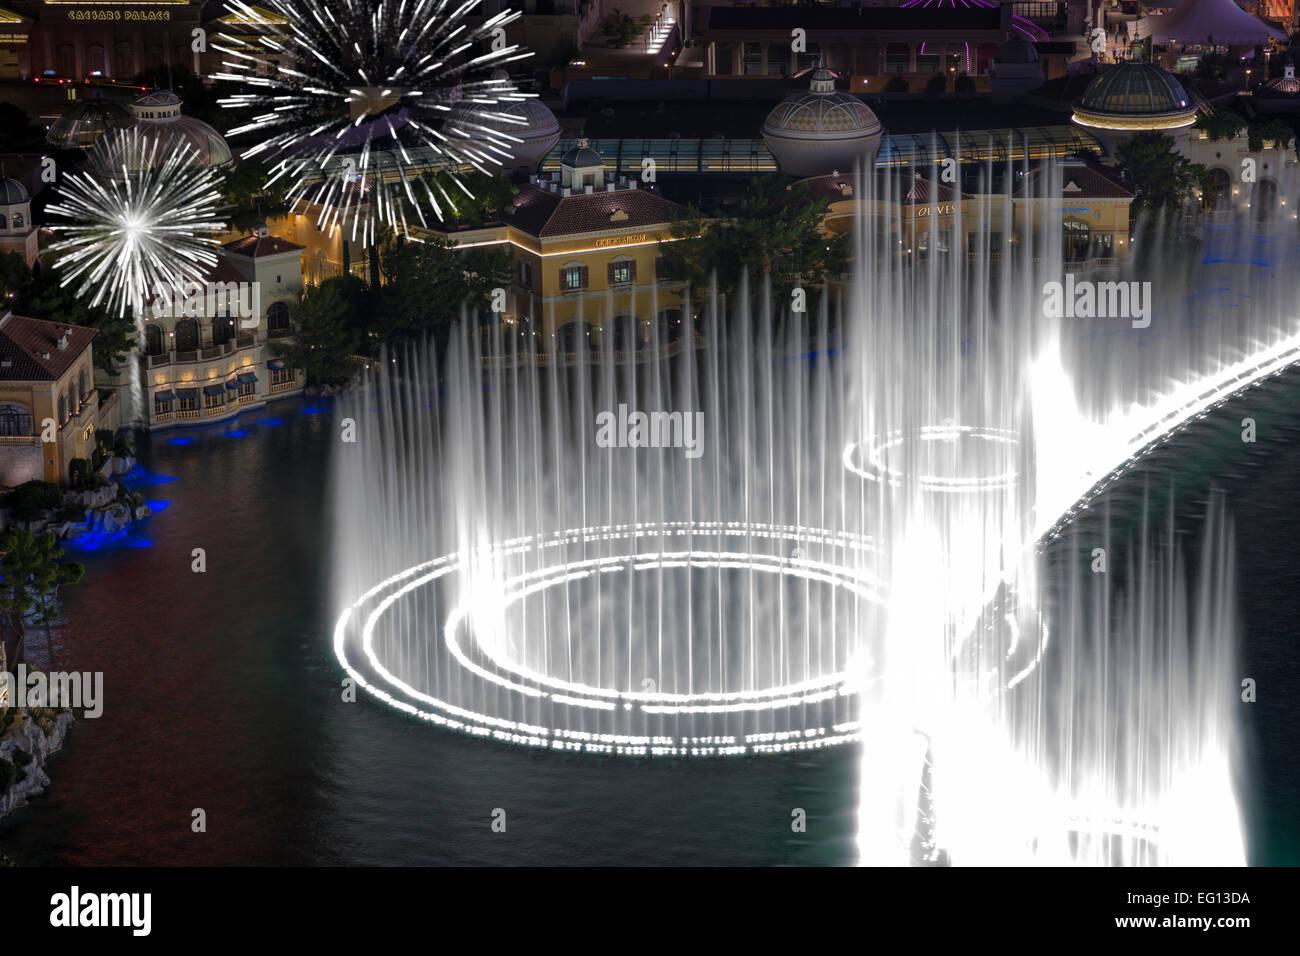 HOTEL CASINOS BELLAGIO FOUNTAINS SOUND LIGHT SHOW THE STRIP LAS VEGAS NEVADA USA Stock Photo